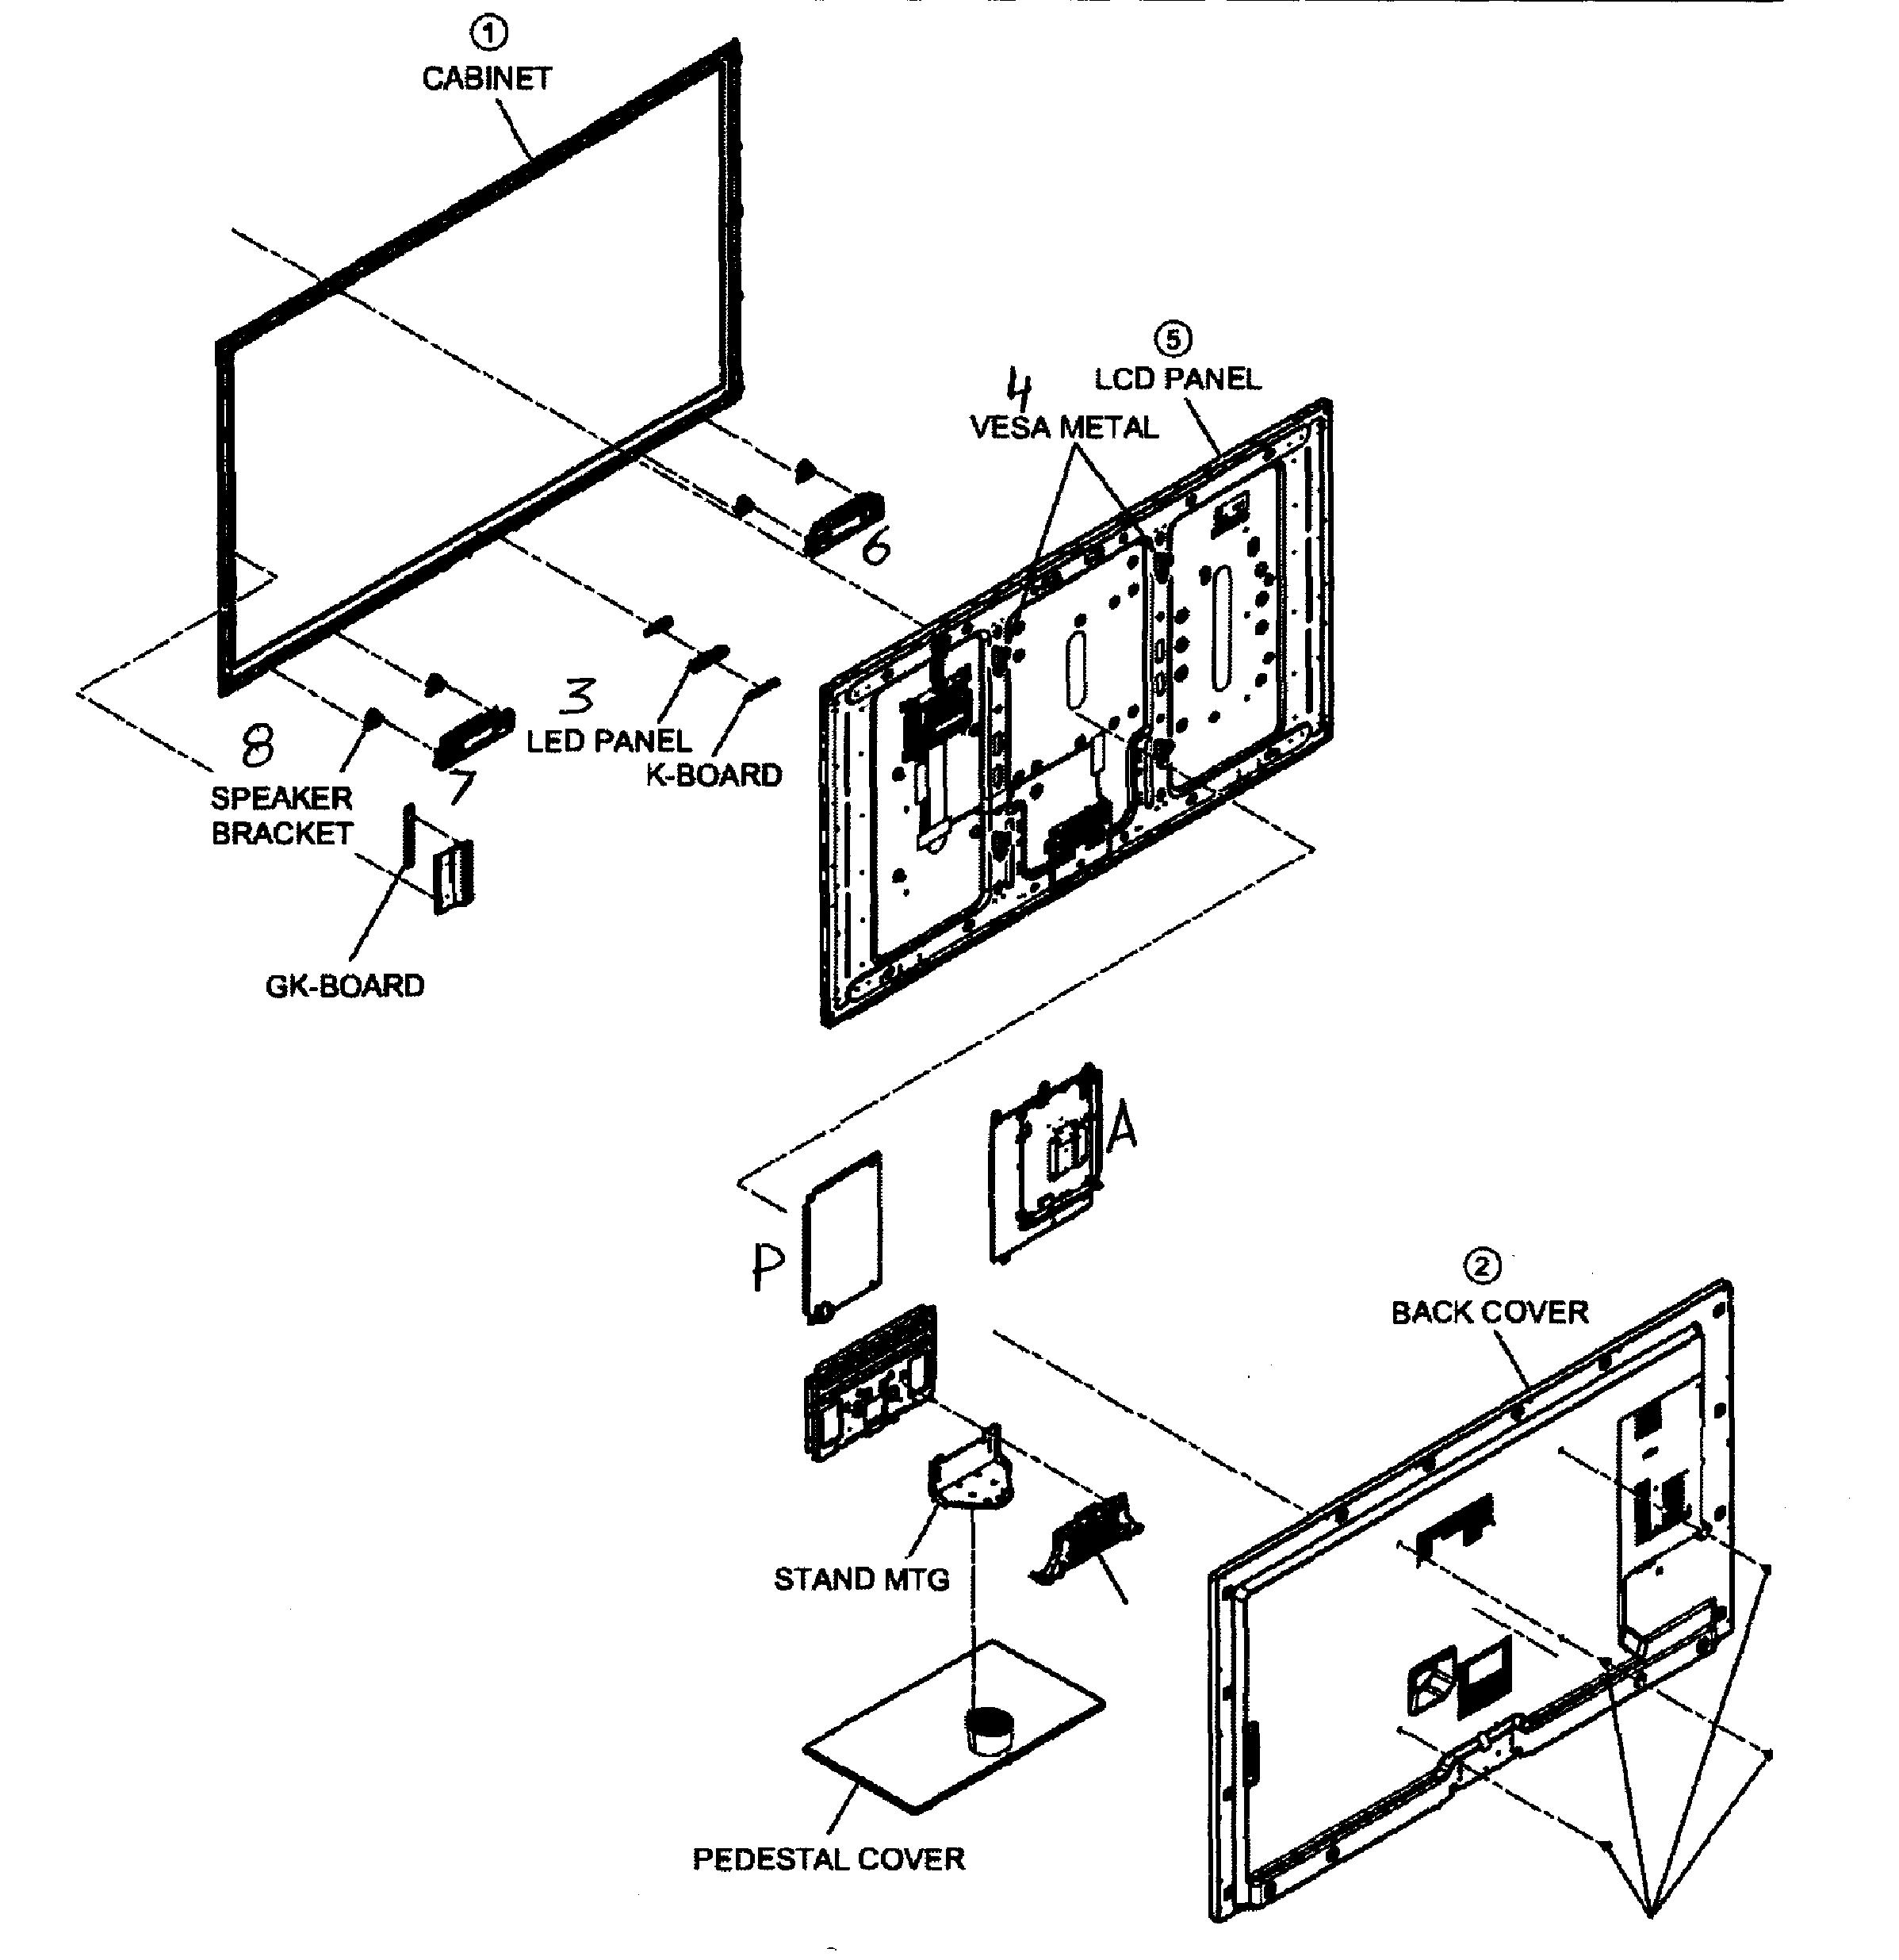 Panasonic model TC-L55E50 lcd television genuine parts